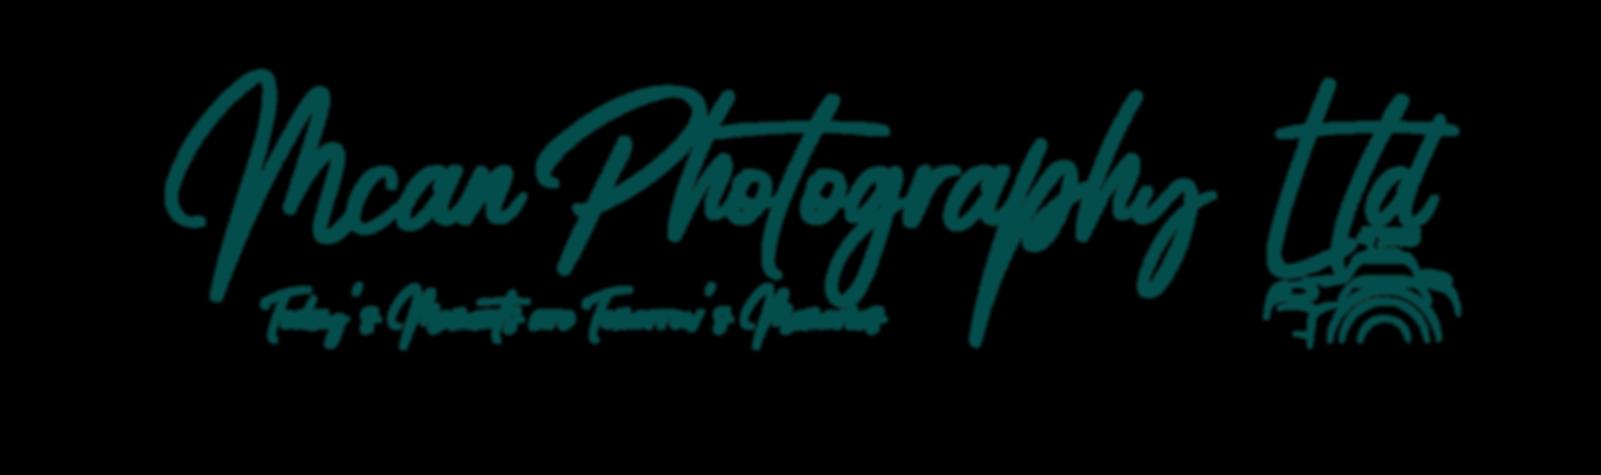 2020 signature & Logo.png